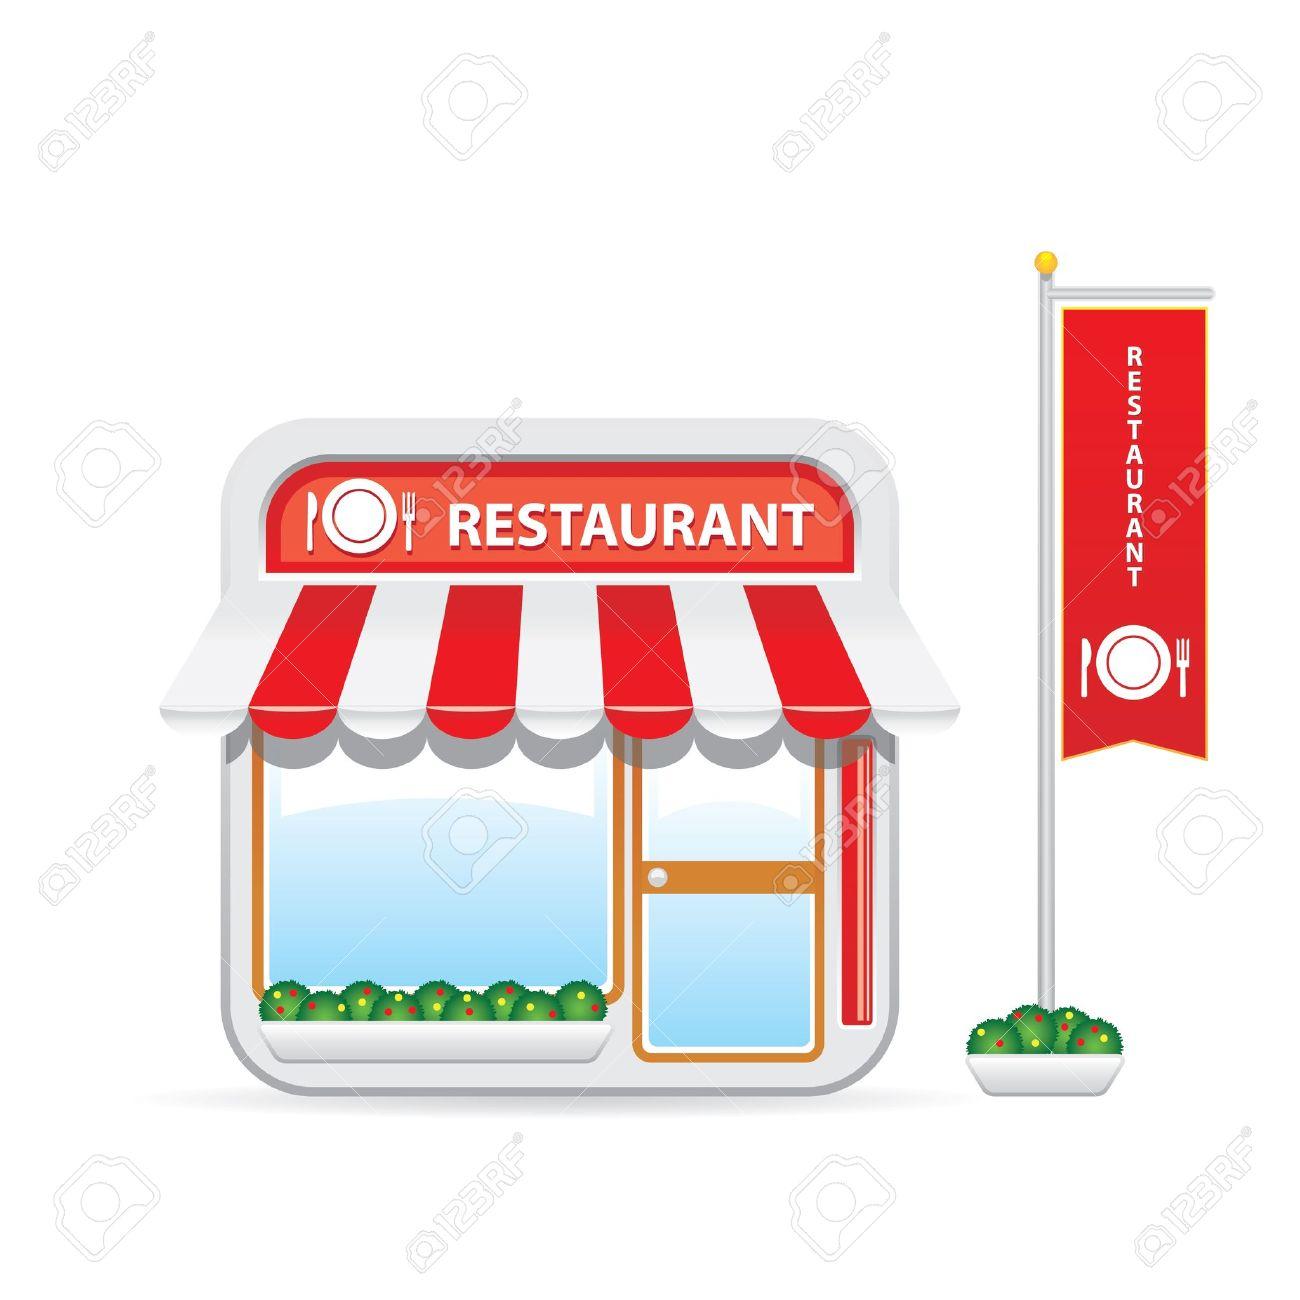 Building cartoon clipart restaurant building and restaurant building - Restaurant Icon Stock Vector 17543113 Restaurant Icon Restaurant Building Cartoon